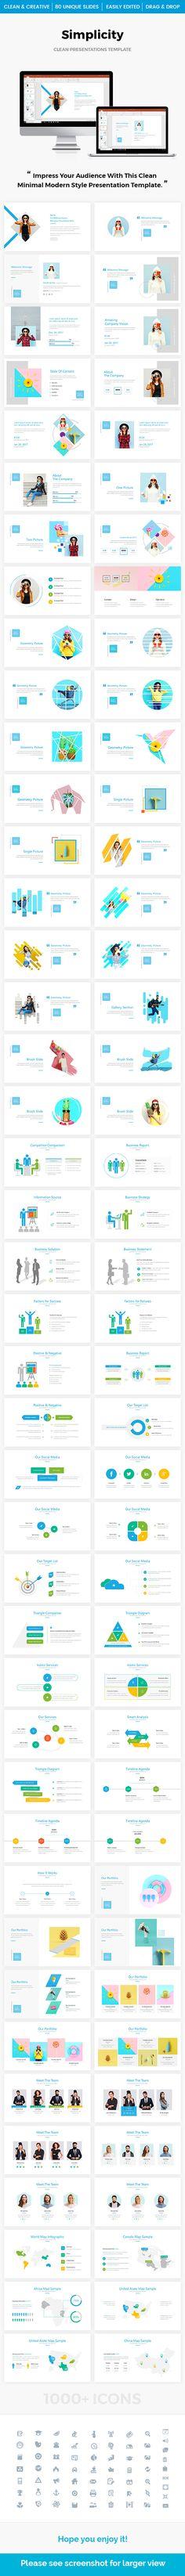 Simplicity - Multipurpose #PowerPoint Template 2018 - PowerPoint Templates Presentation Templates